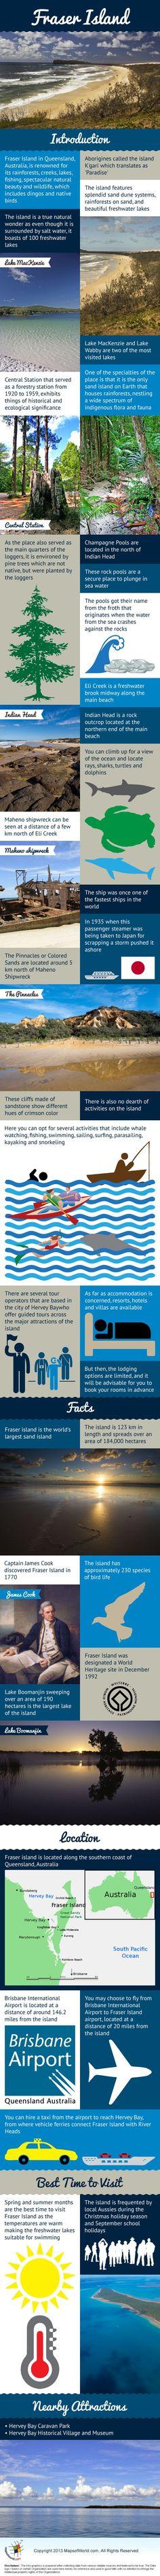 Your guide to our backyard  #fraserisland #queensland #australia www.fraserisland.net